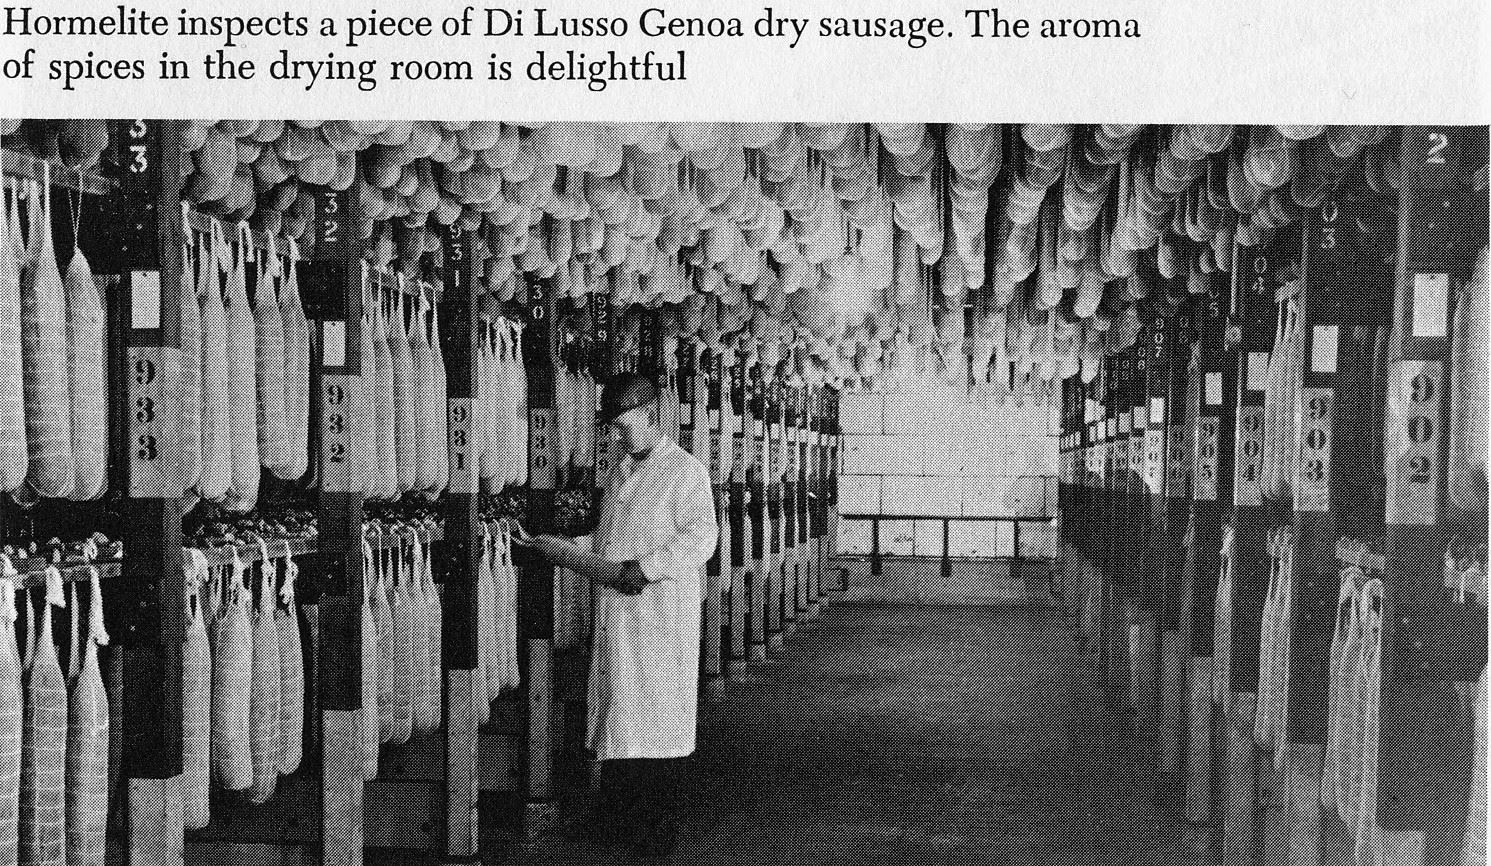 hormel dry sausage